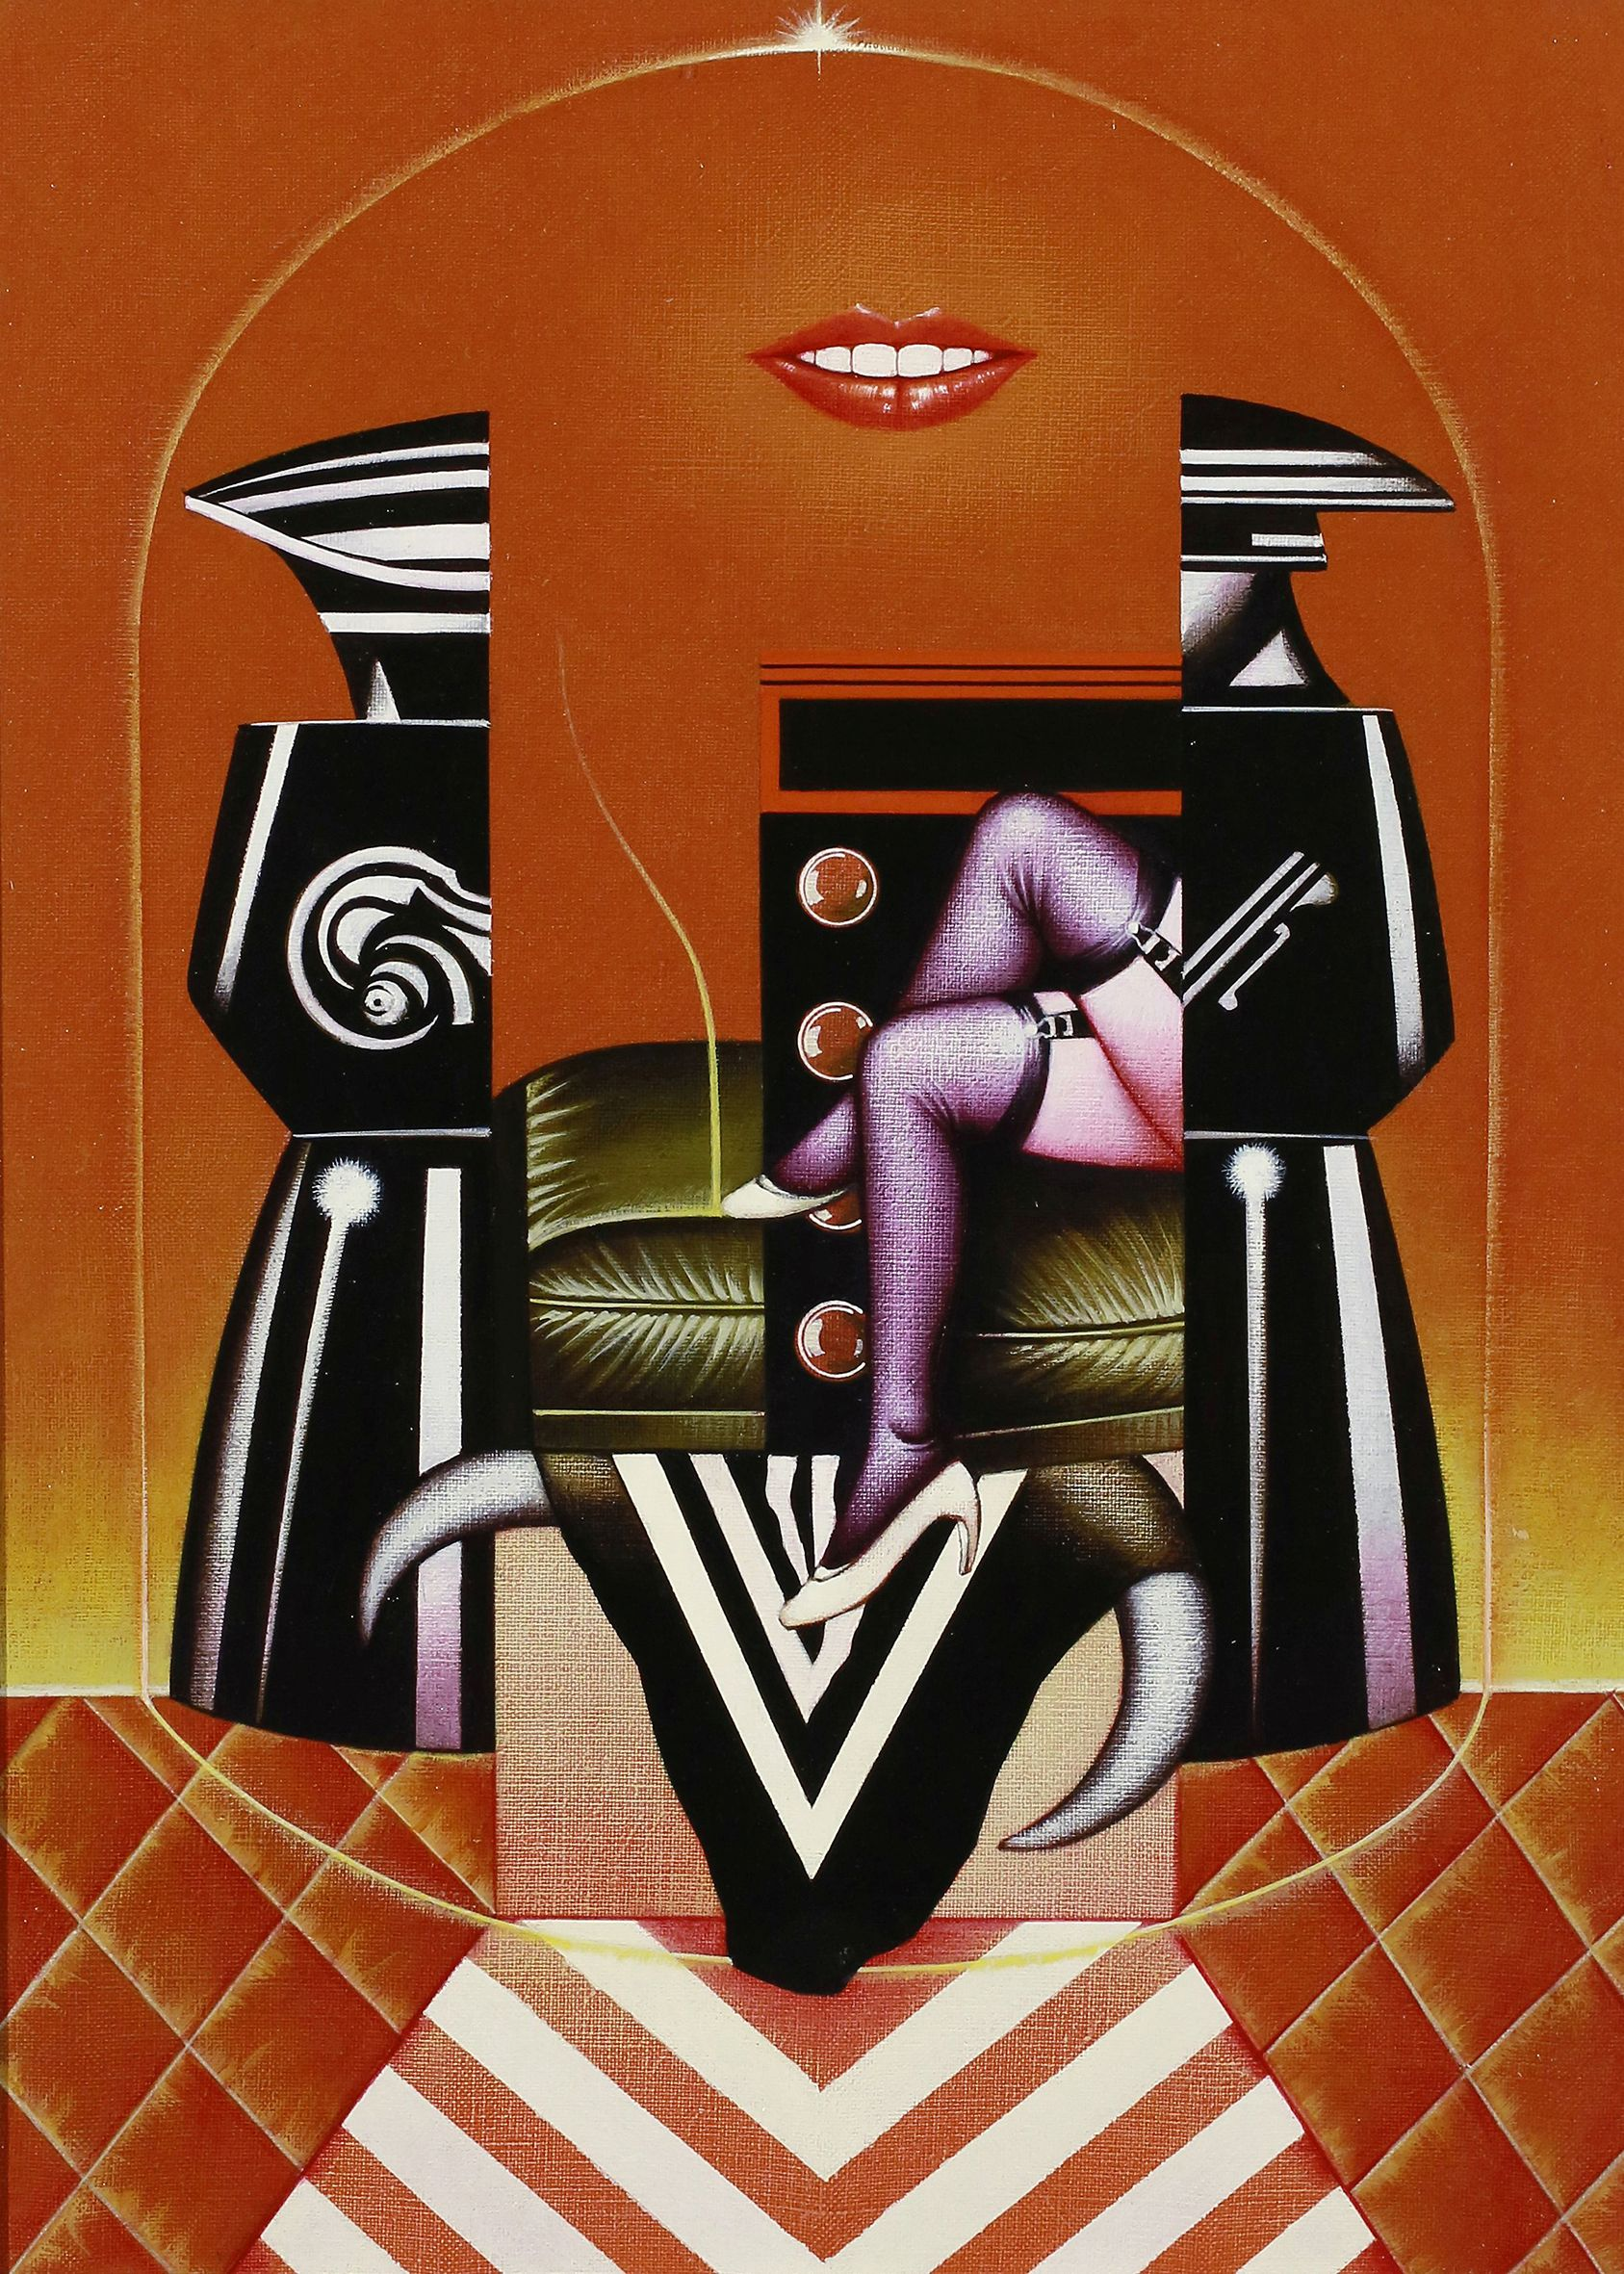 Sergio Sarri, Studio per Belle de Jour (omaggio a Bunuel), 1985, acrilico su tela, 55x40 cm